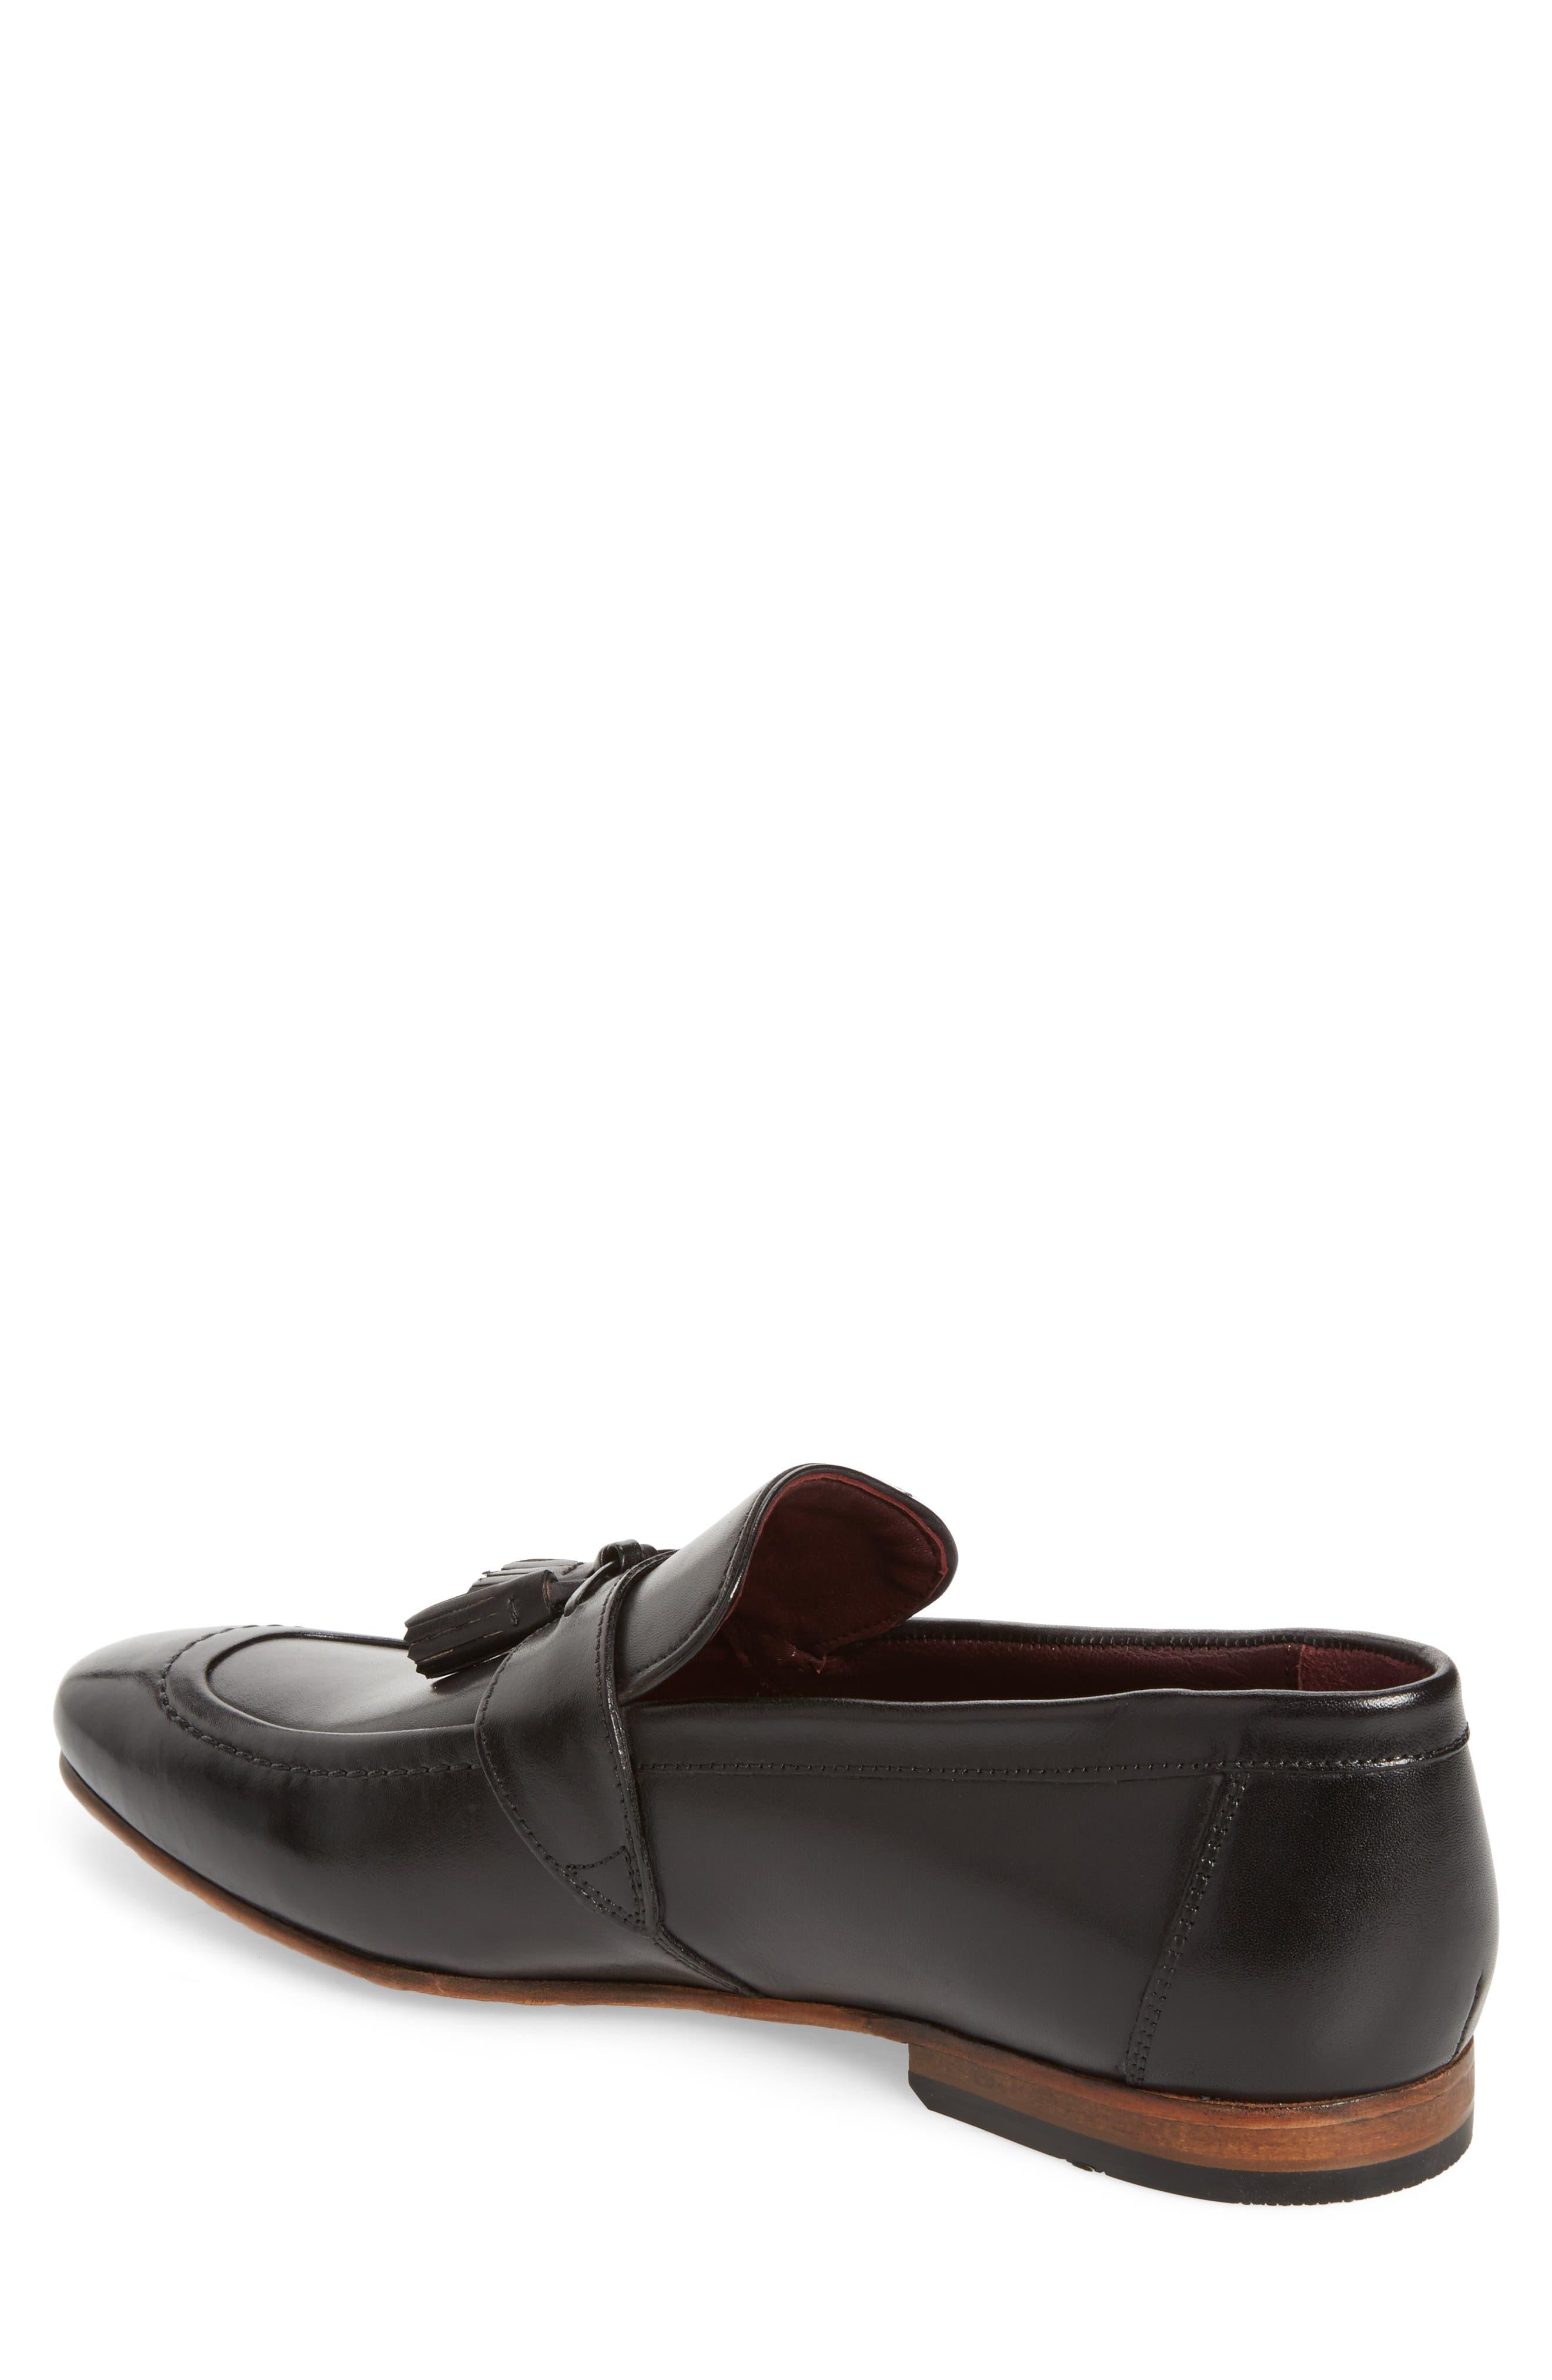 Grafit Tassel Loafer,                             Alternate thumbnail 2, color,                             Black Leather